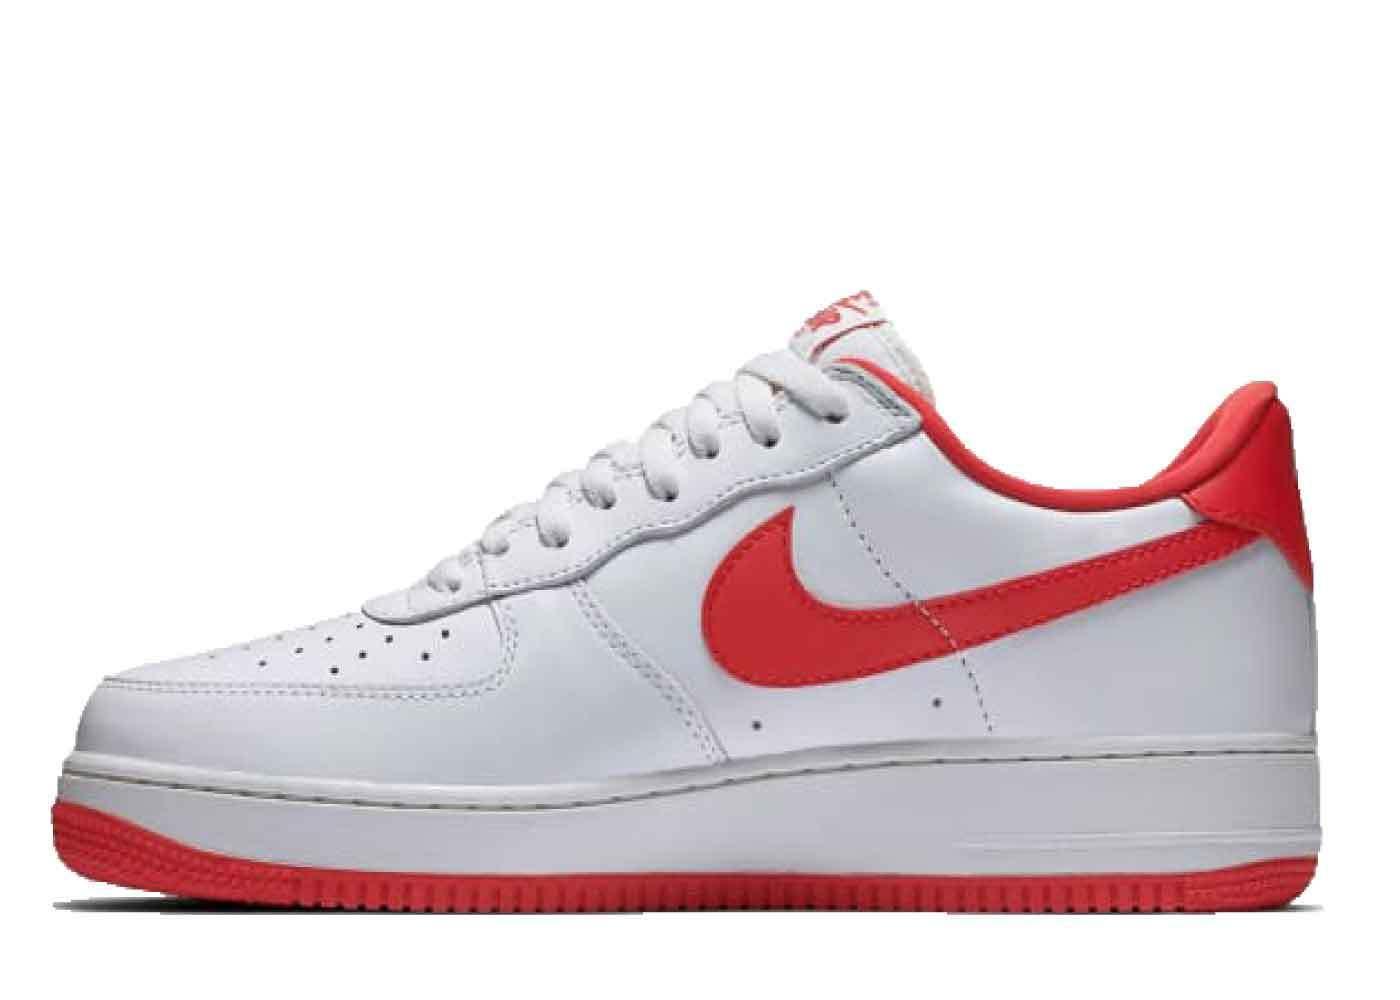 Nike Air Force 1 Low Retro University Red の写真